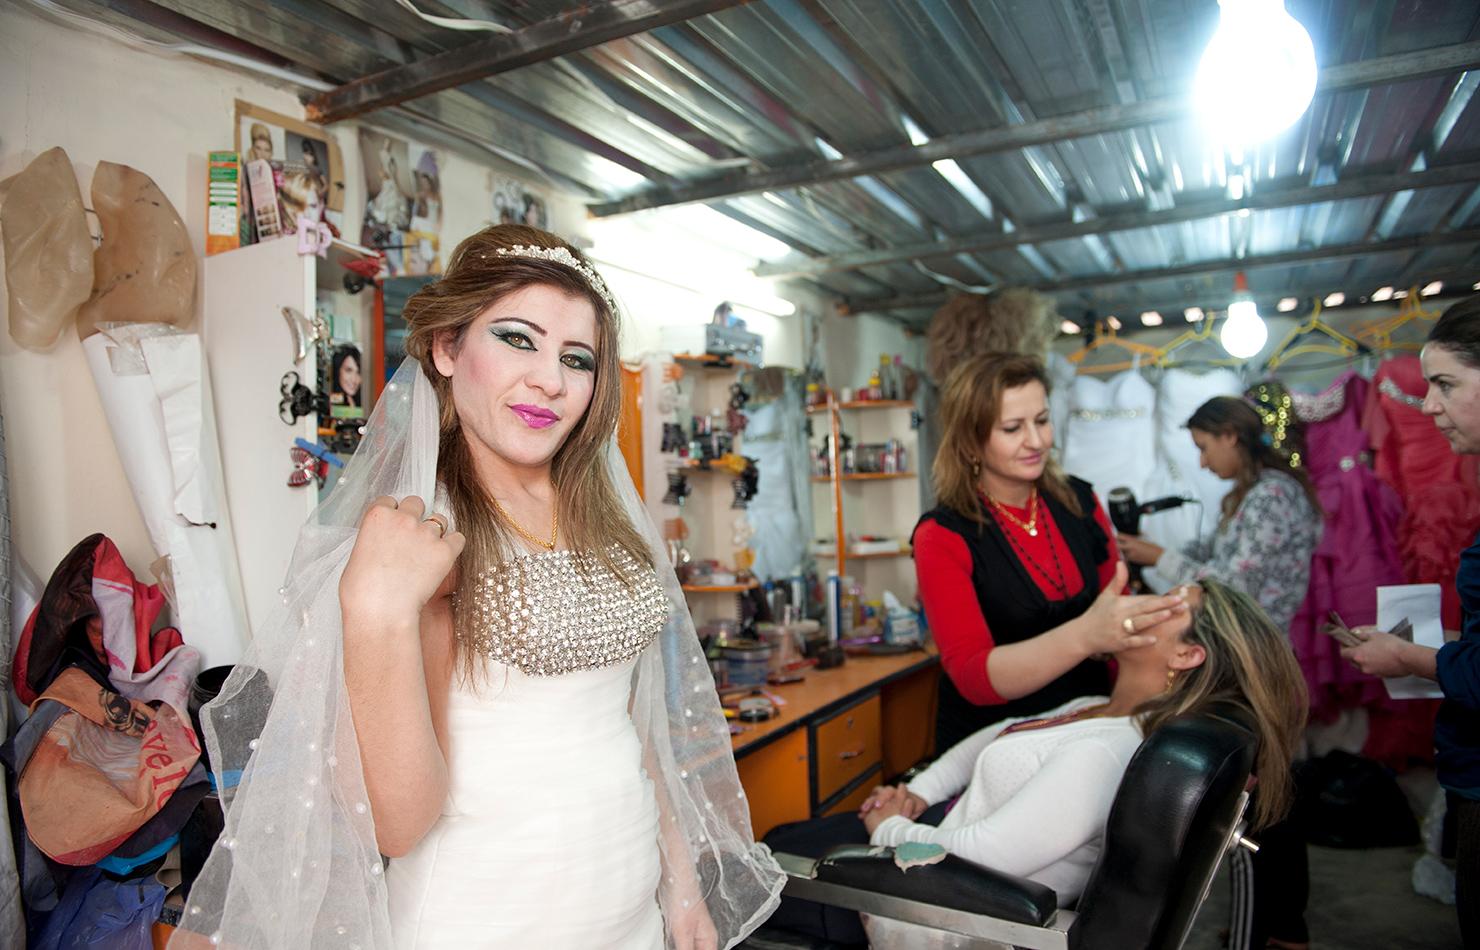 Iraq documentary photography